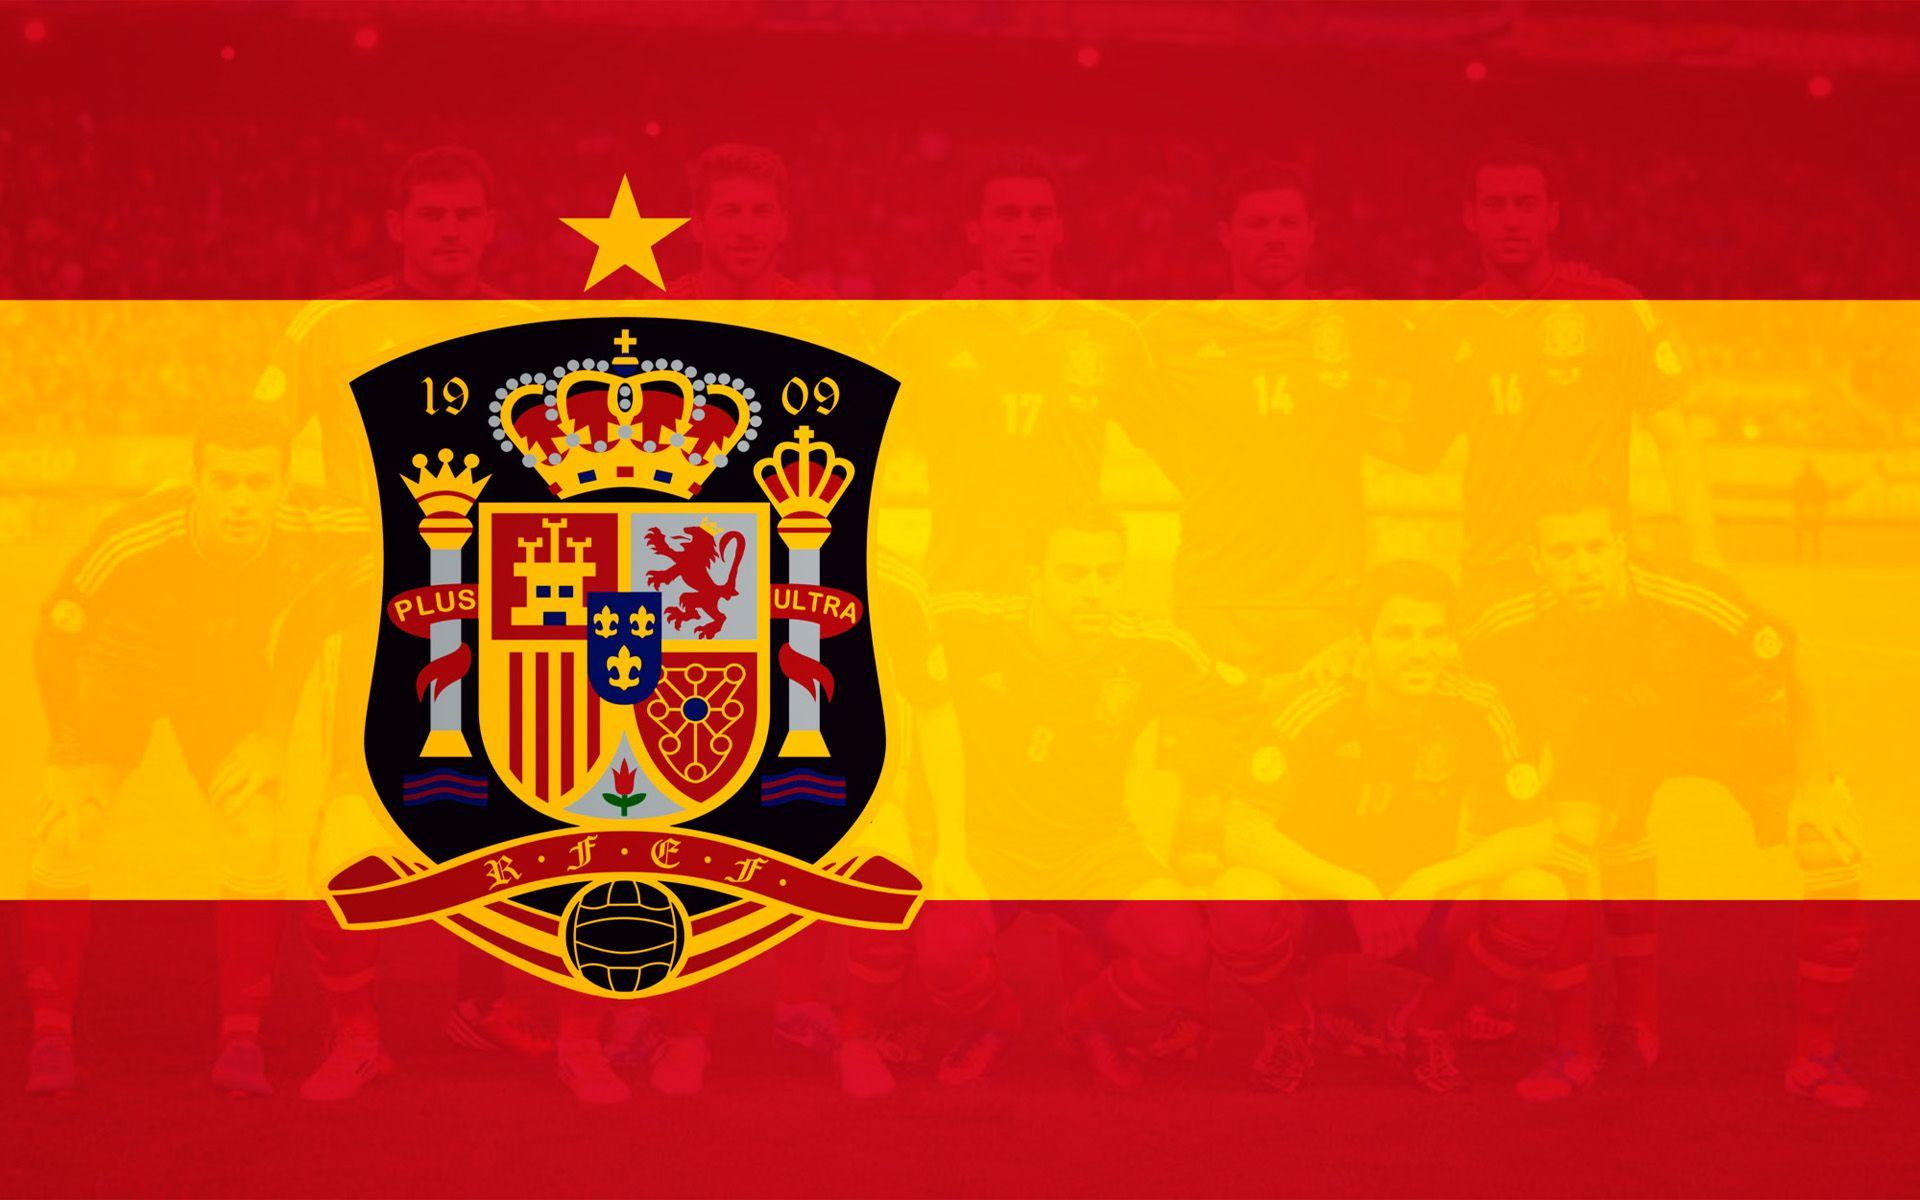 Spain national football Teams background 2